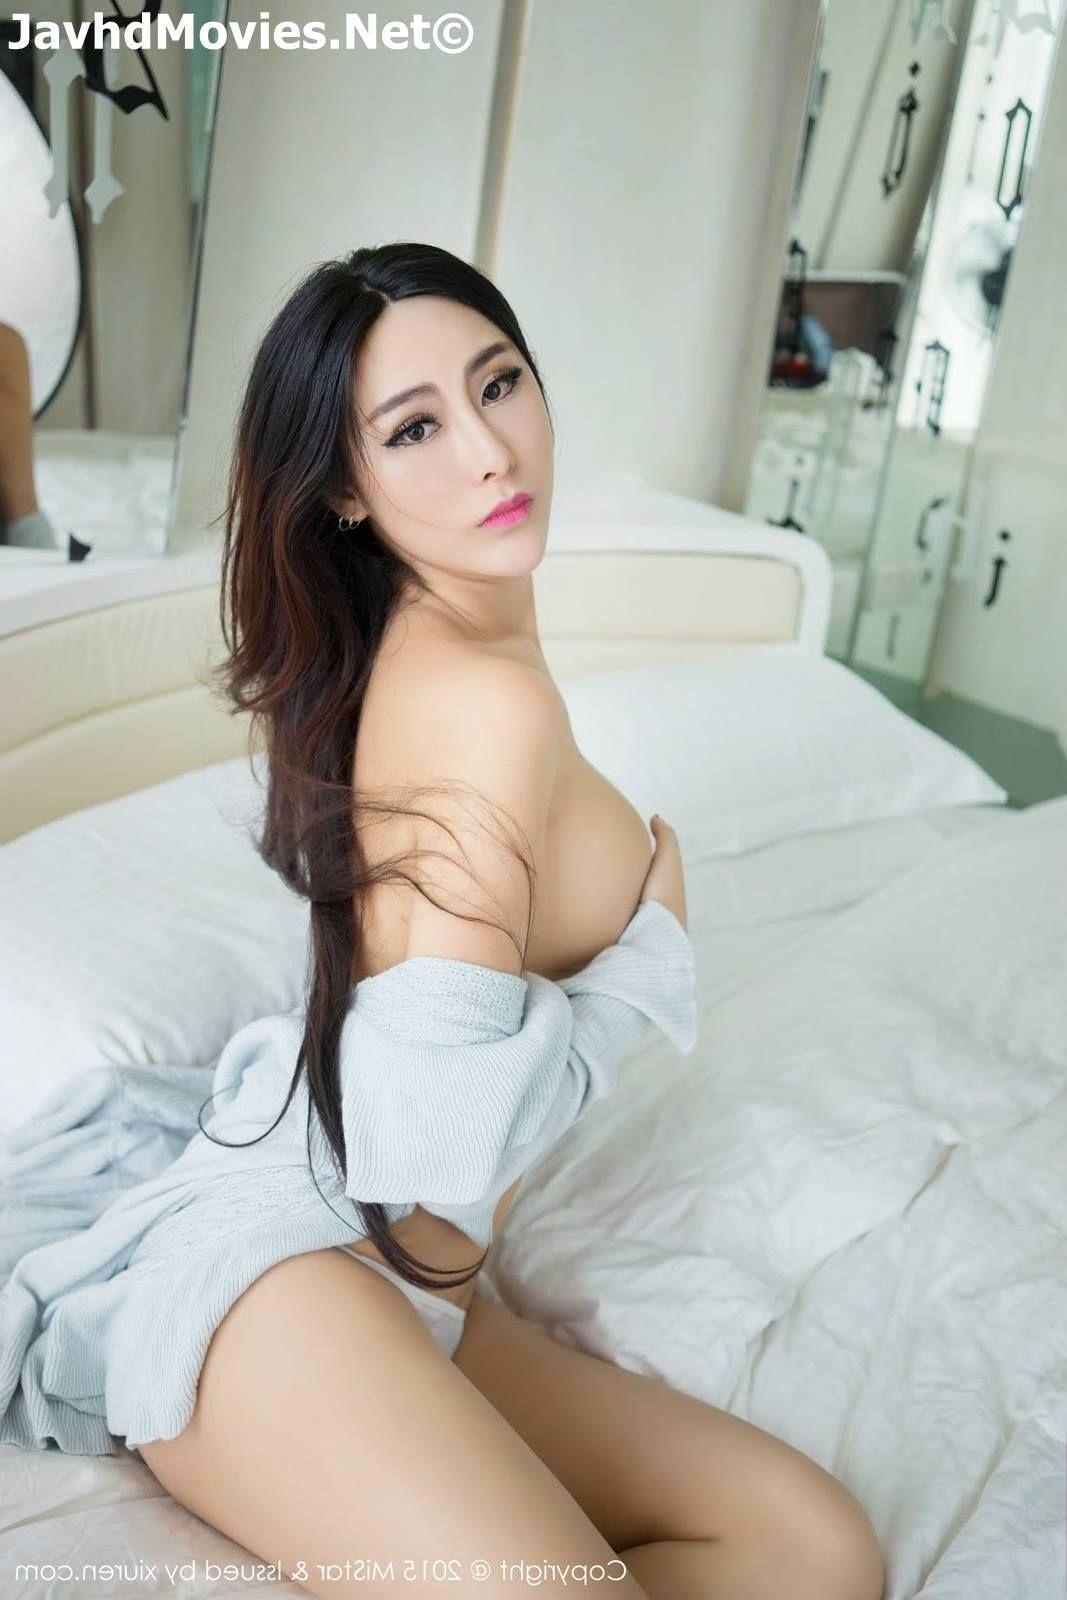 Free Hd Porn Watch Online